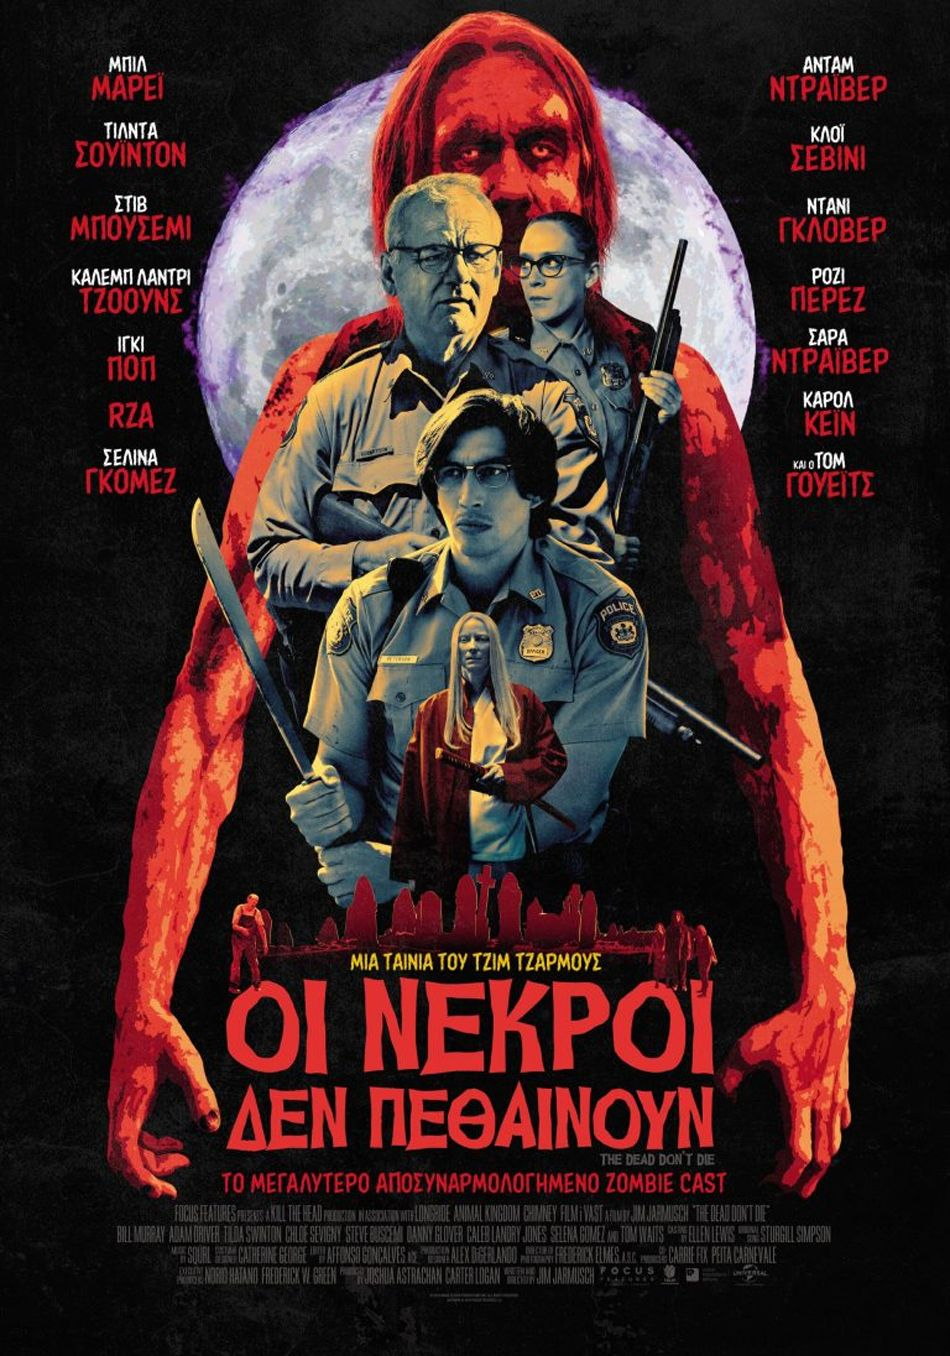 The Dead Don't Die (Οι Νεκροί Δεν Πεθαίνουν) Trailer / Τρέιλερ Poster